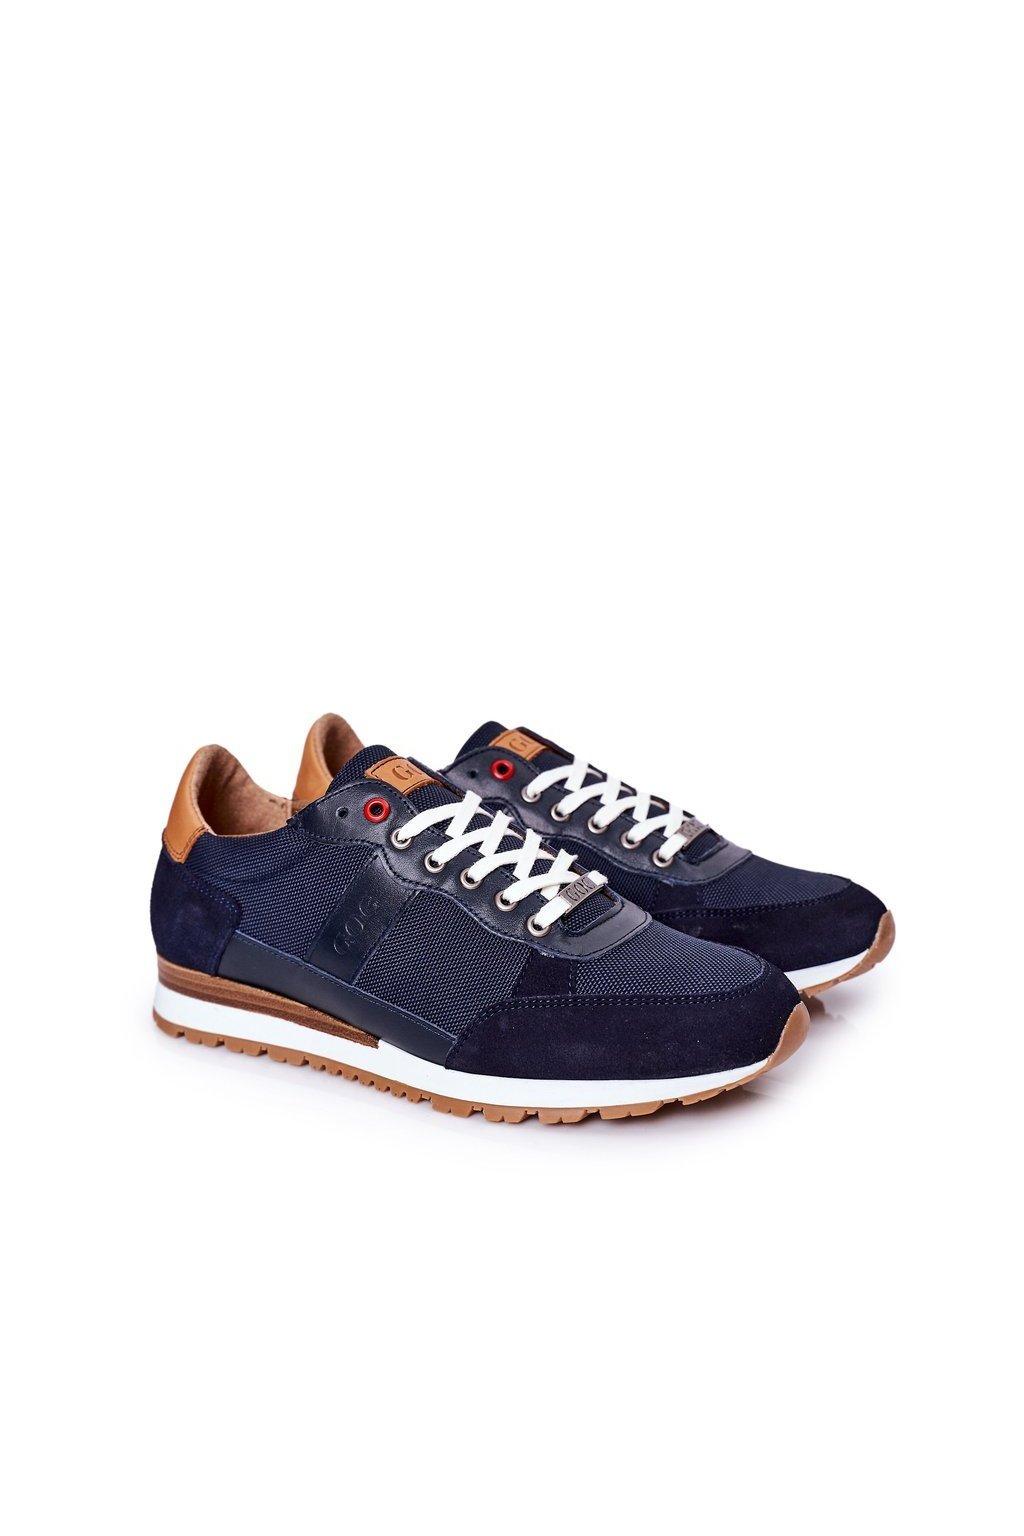 Modrá obuv kód topánok HH1N4053 NAVY